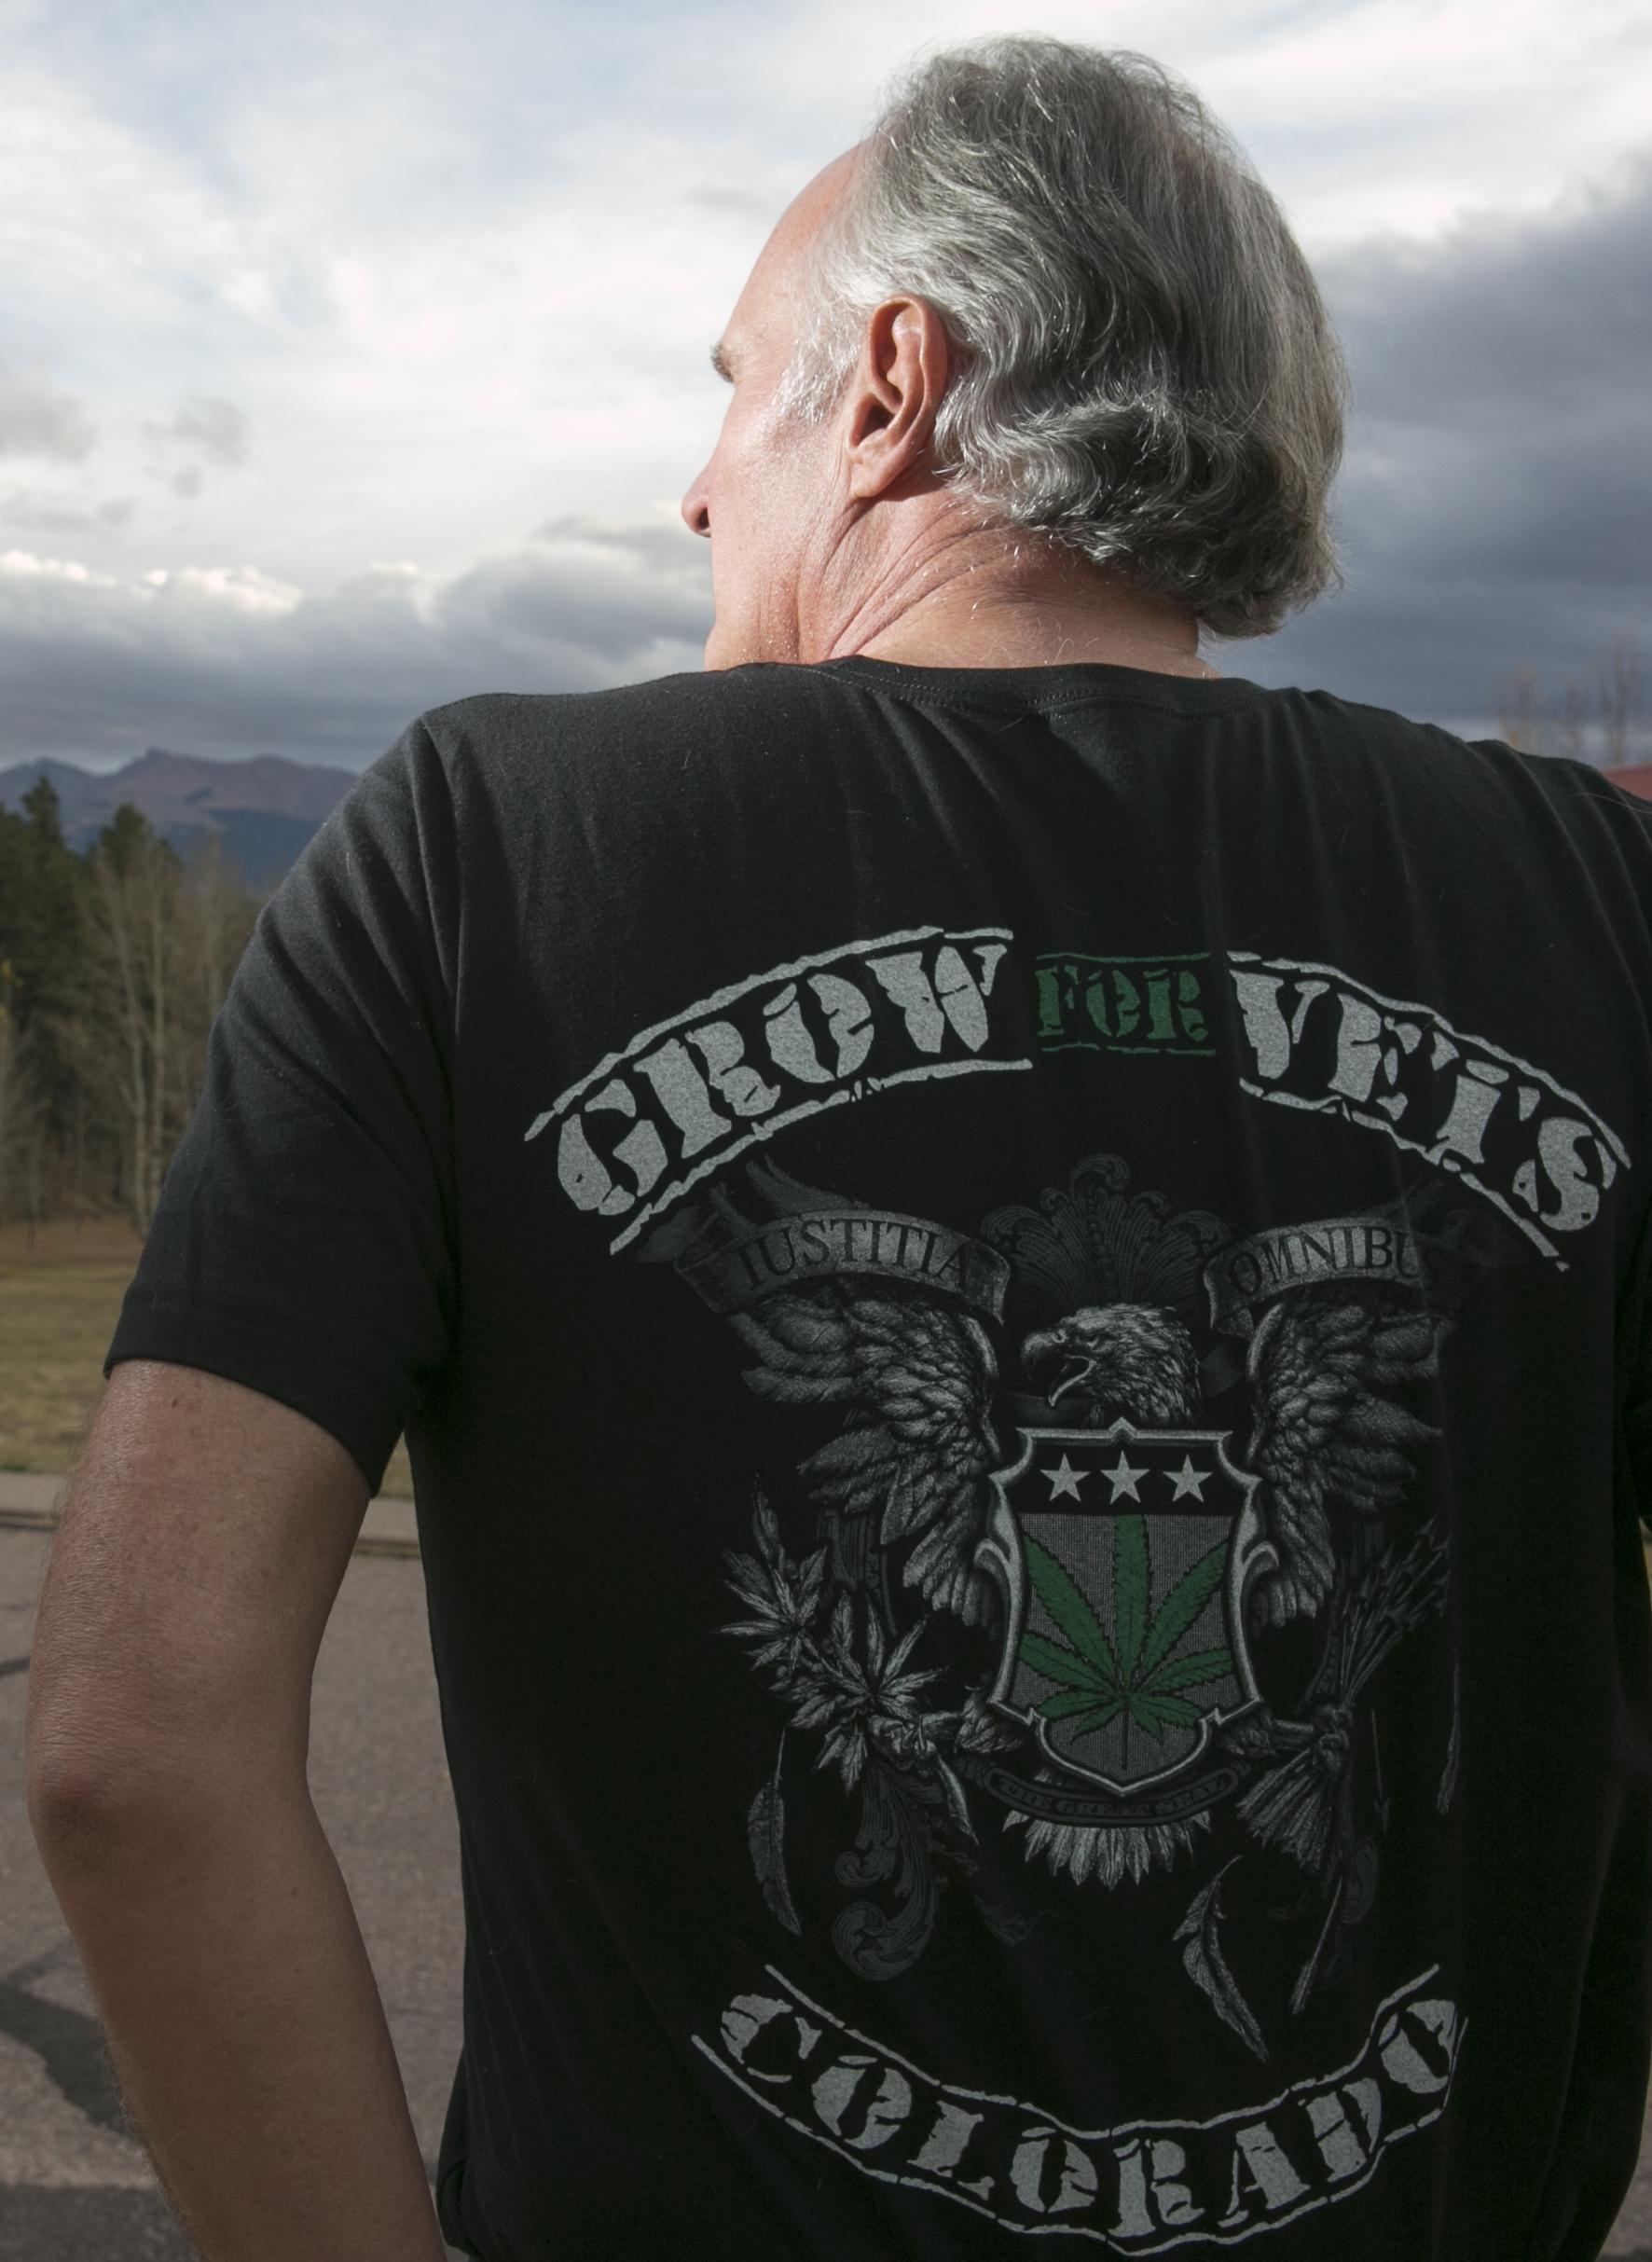 Martin Grow Vets MWM 20151019